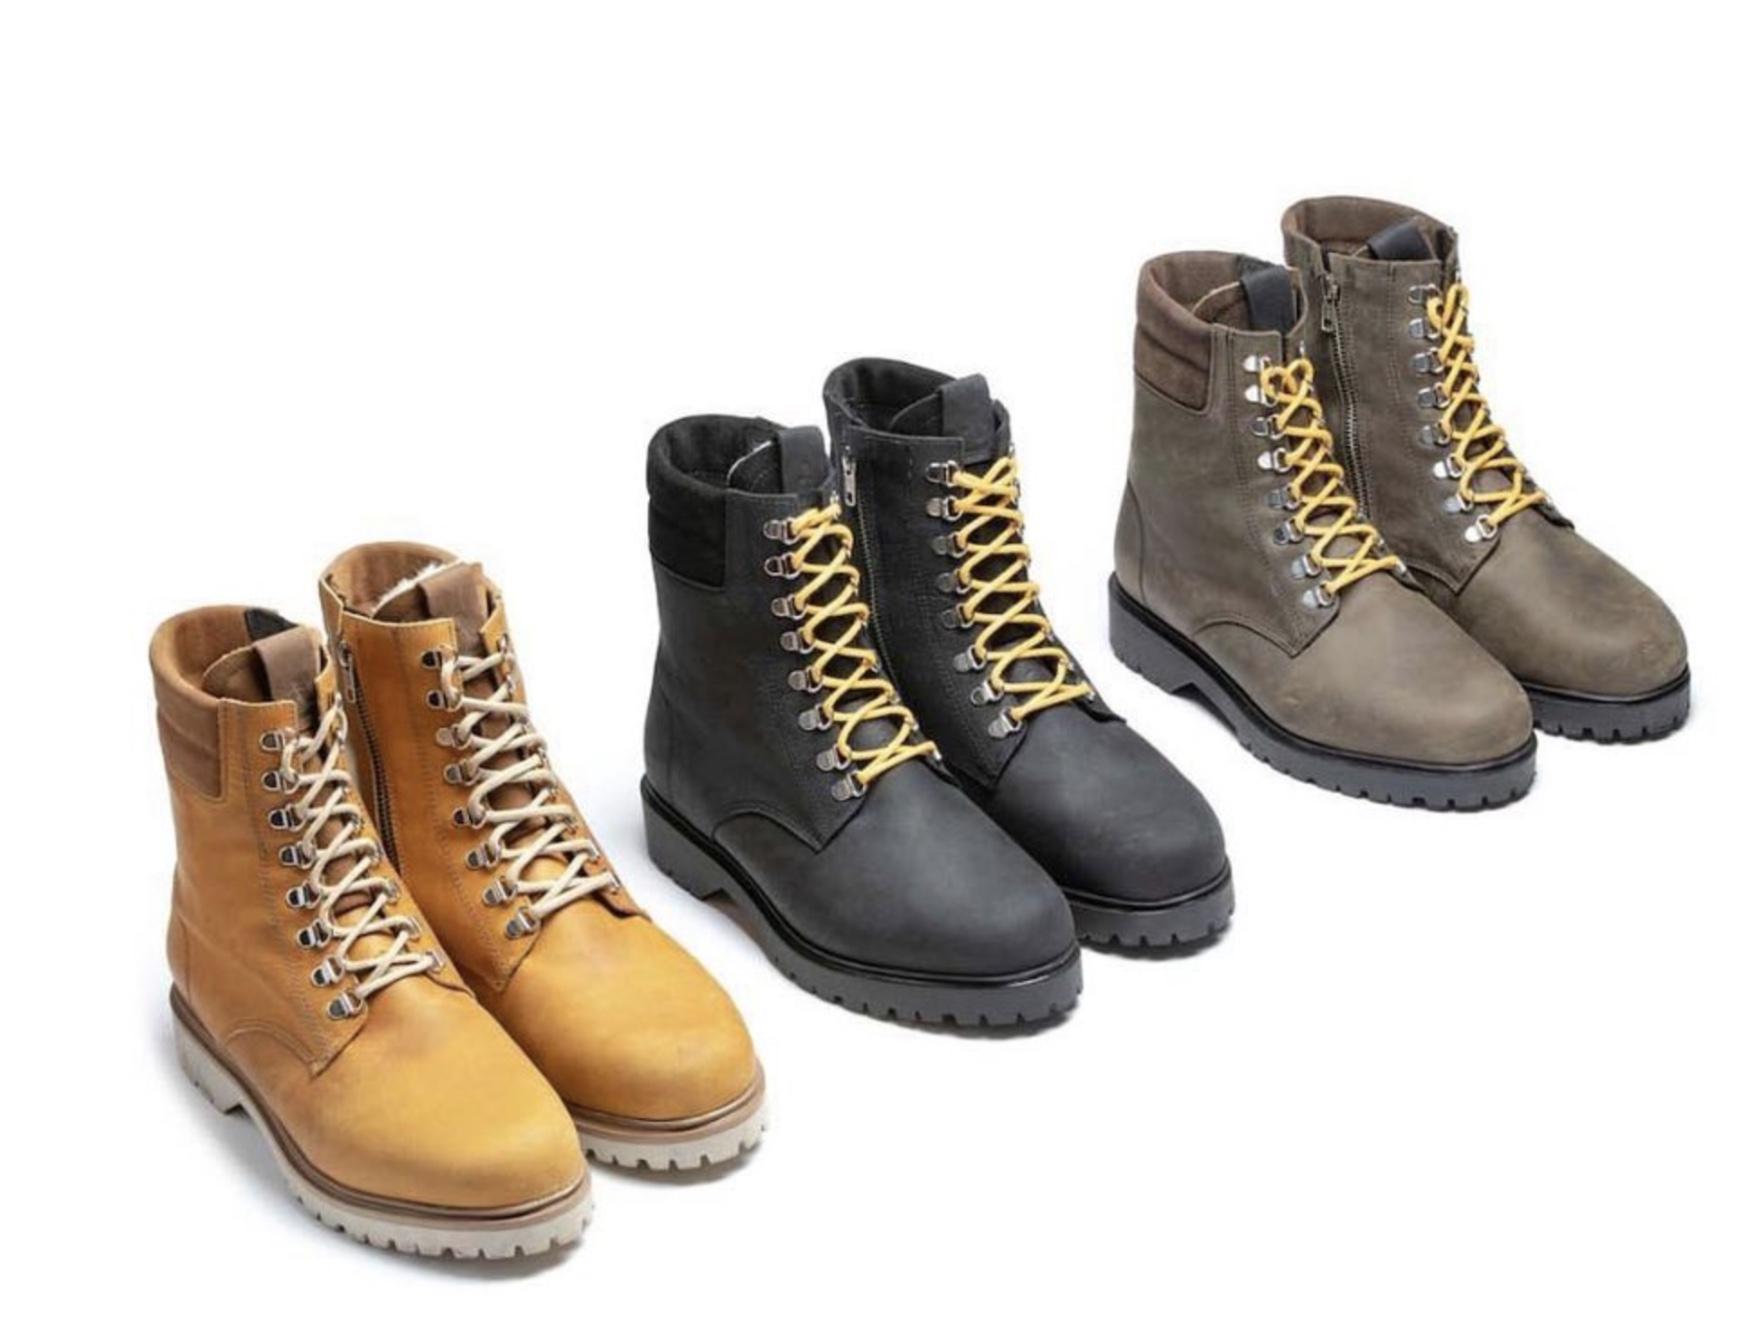 anfibio winter boots